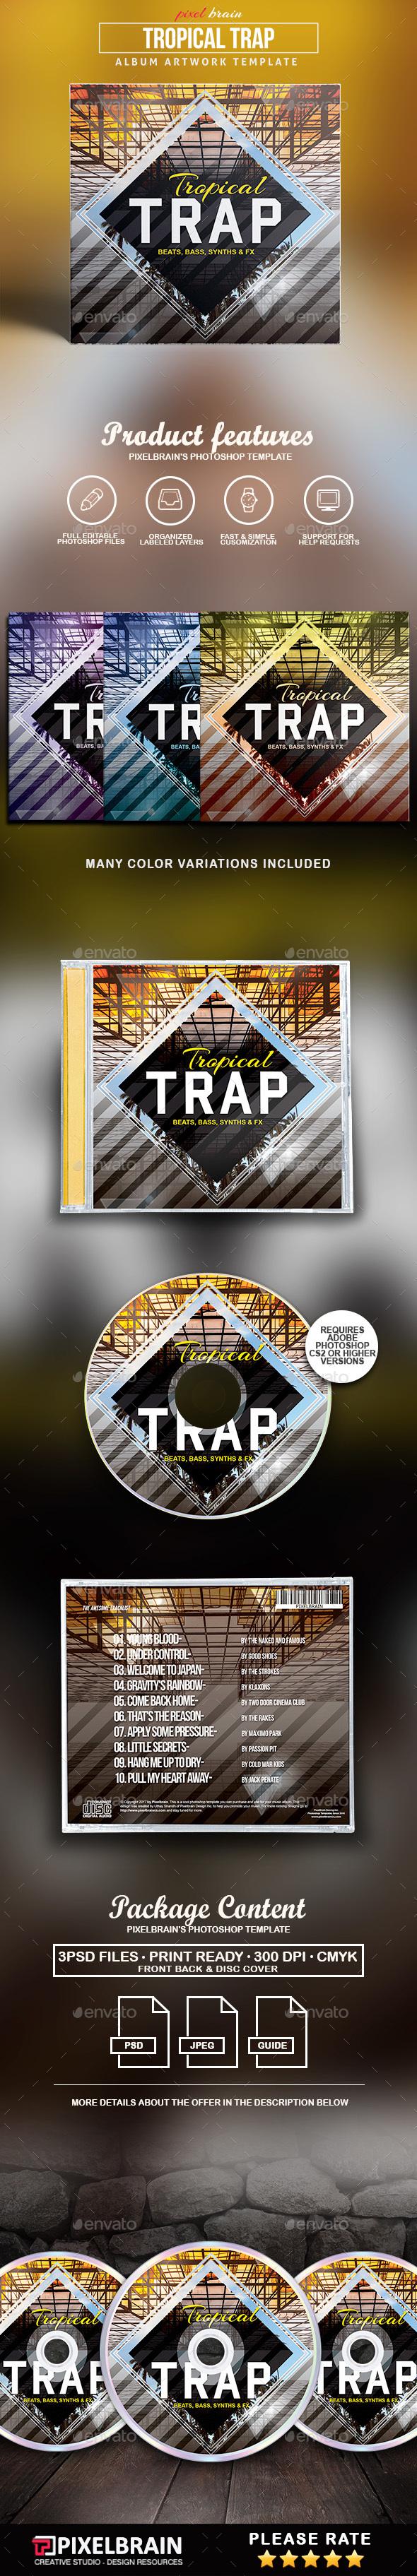 Tropical Trap CD Cover Artwork - CD & DVD Artwork Print Templates